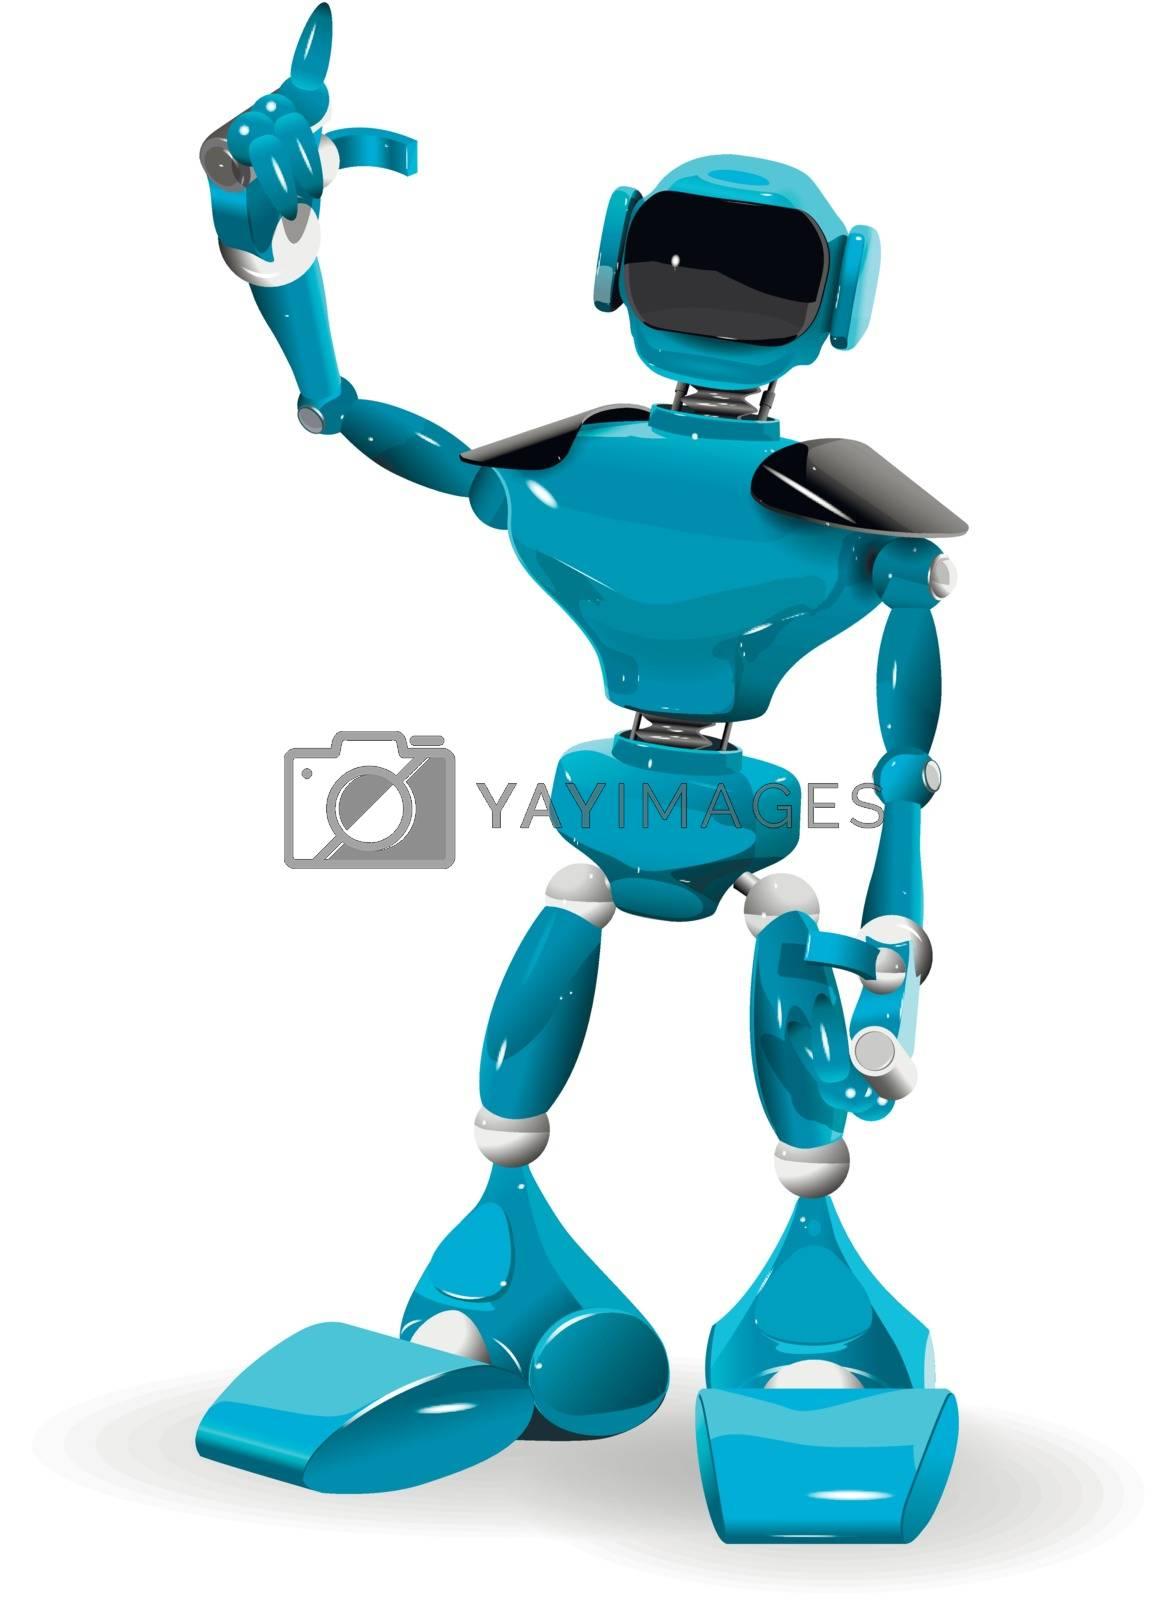 Illustration of a blue robot on white background